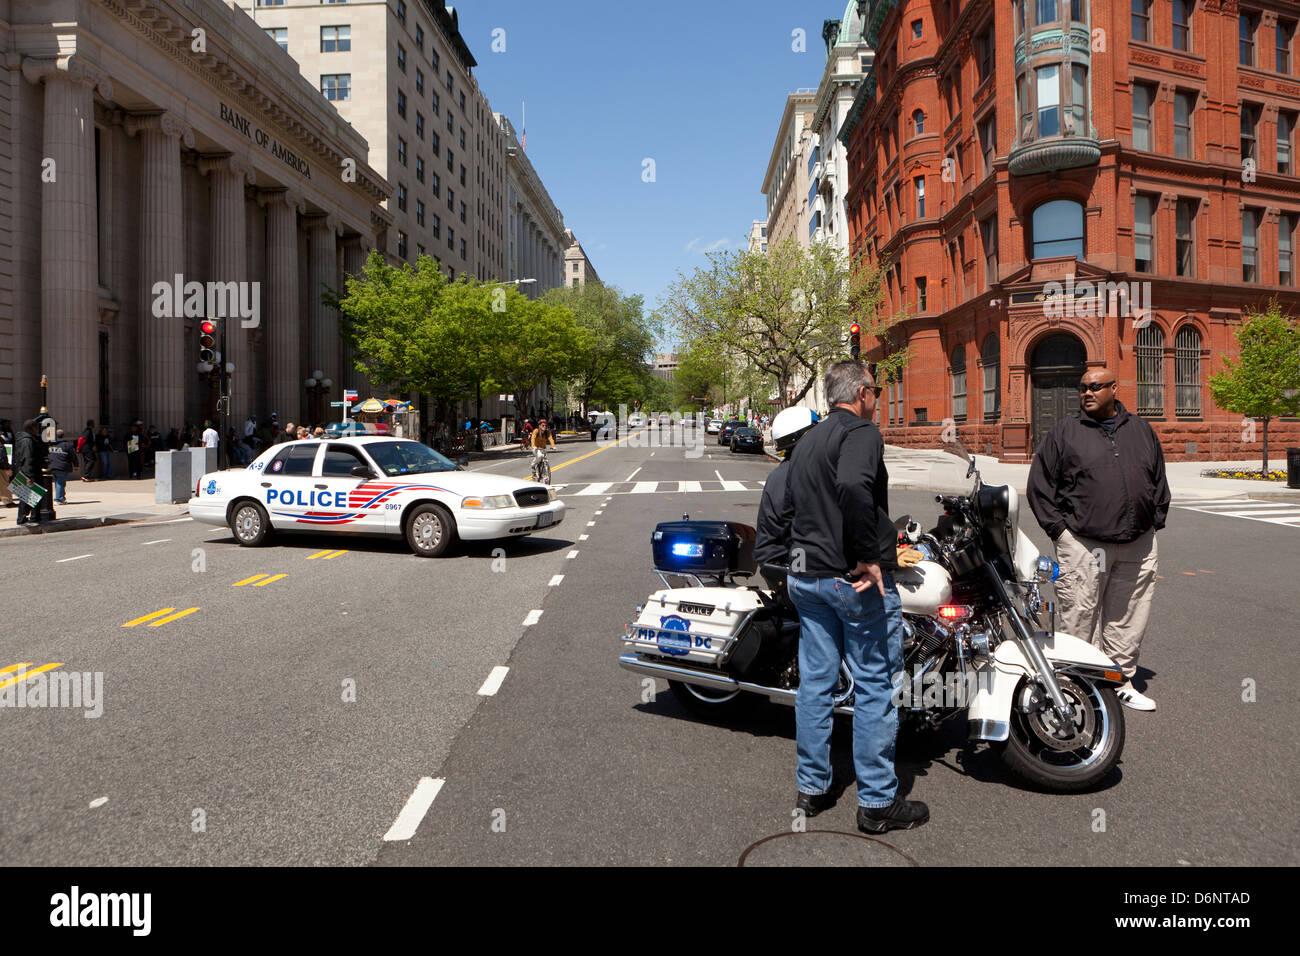 Police roadblock - Washington, DC USA - Stock Image